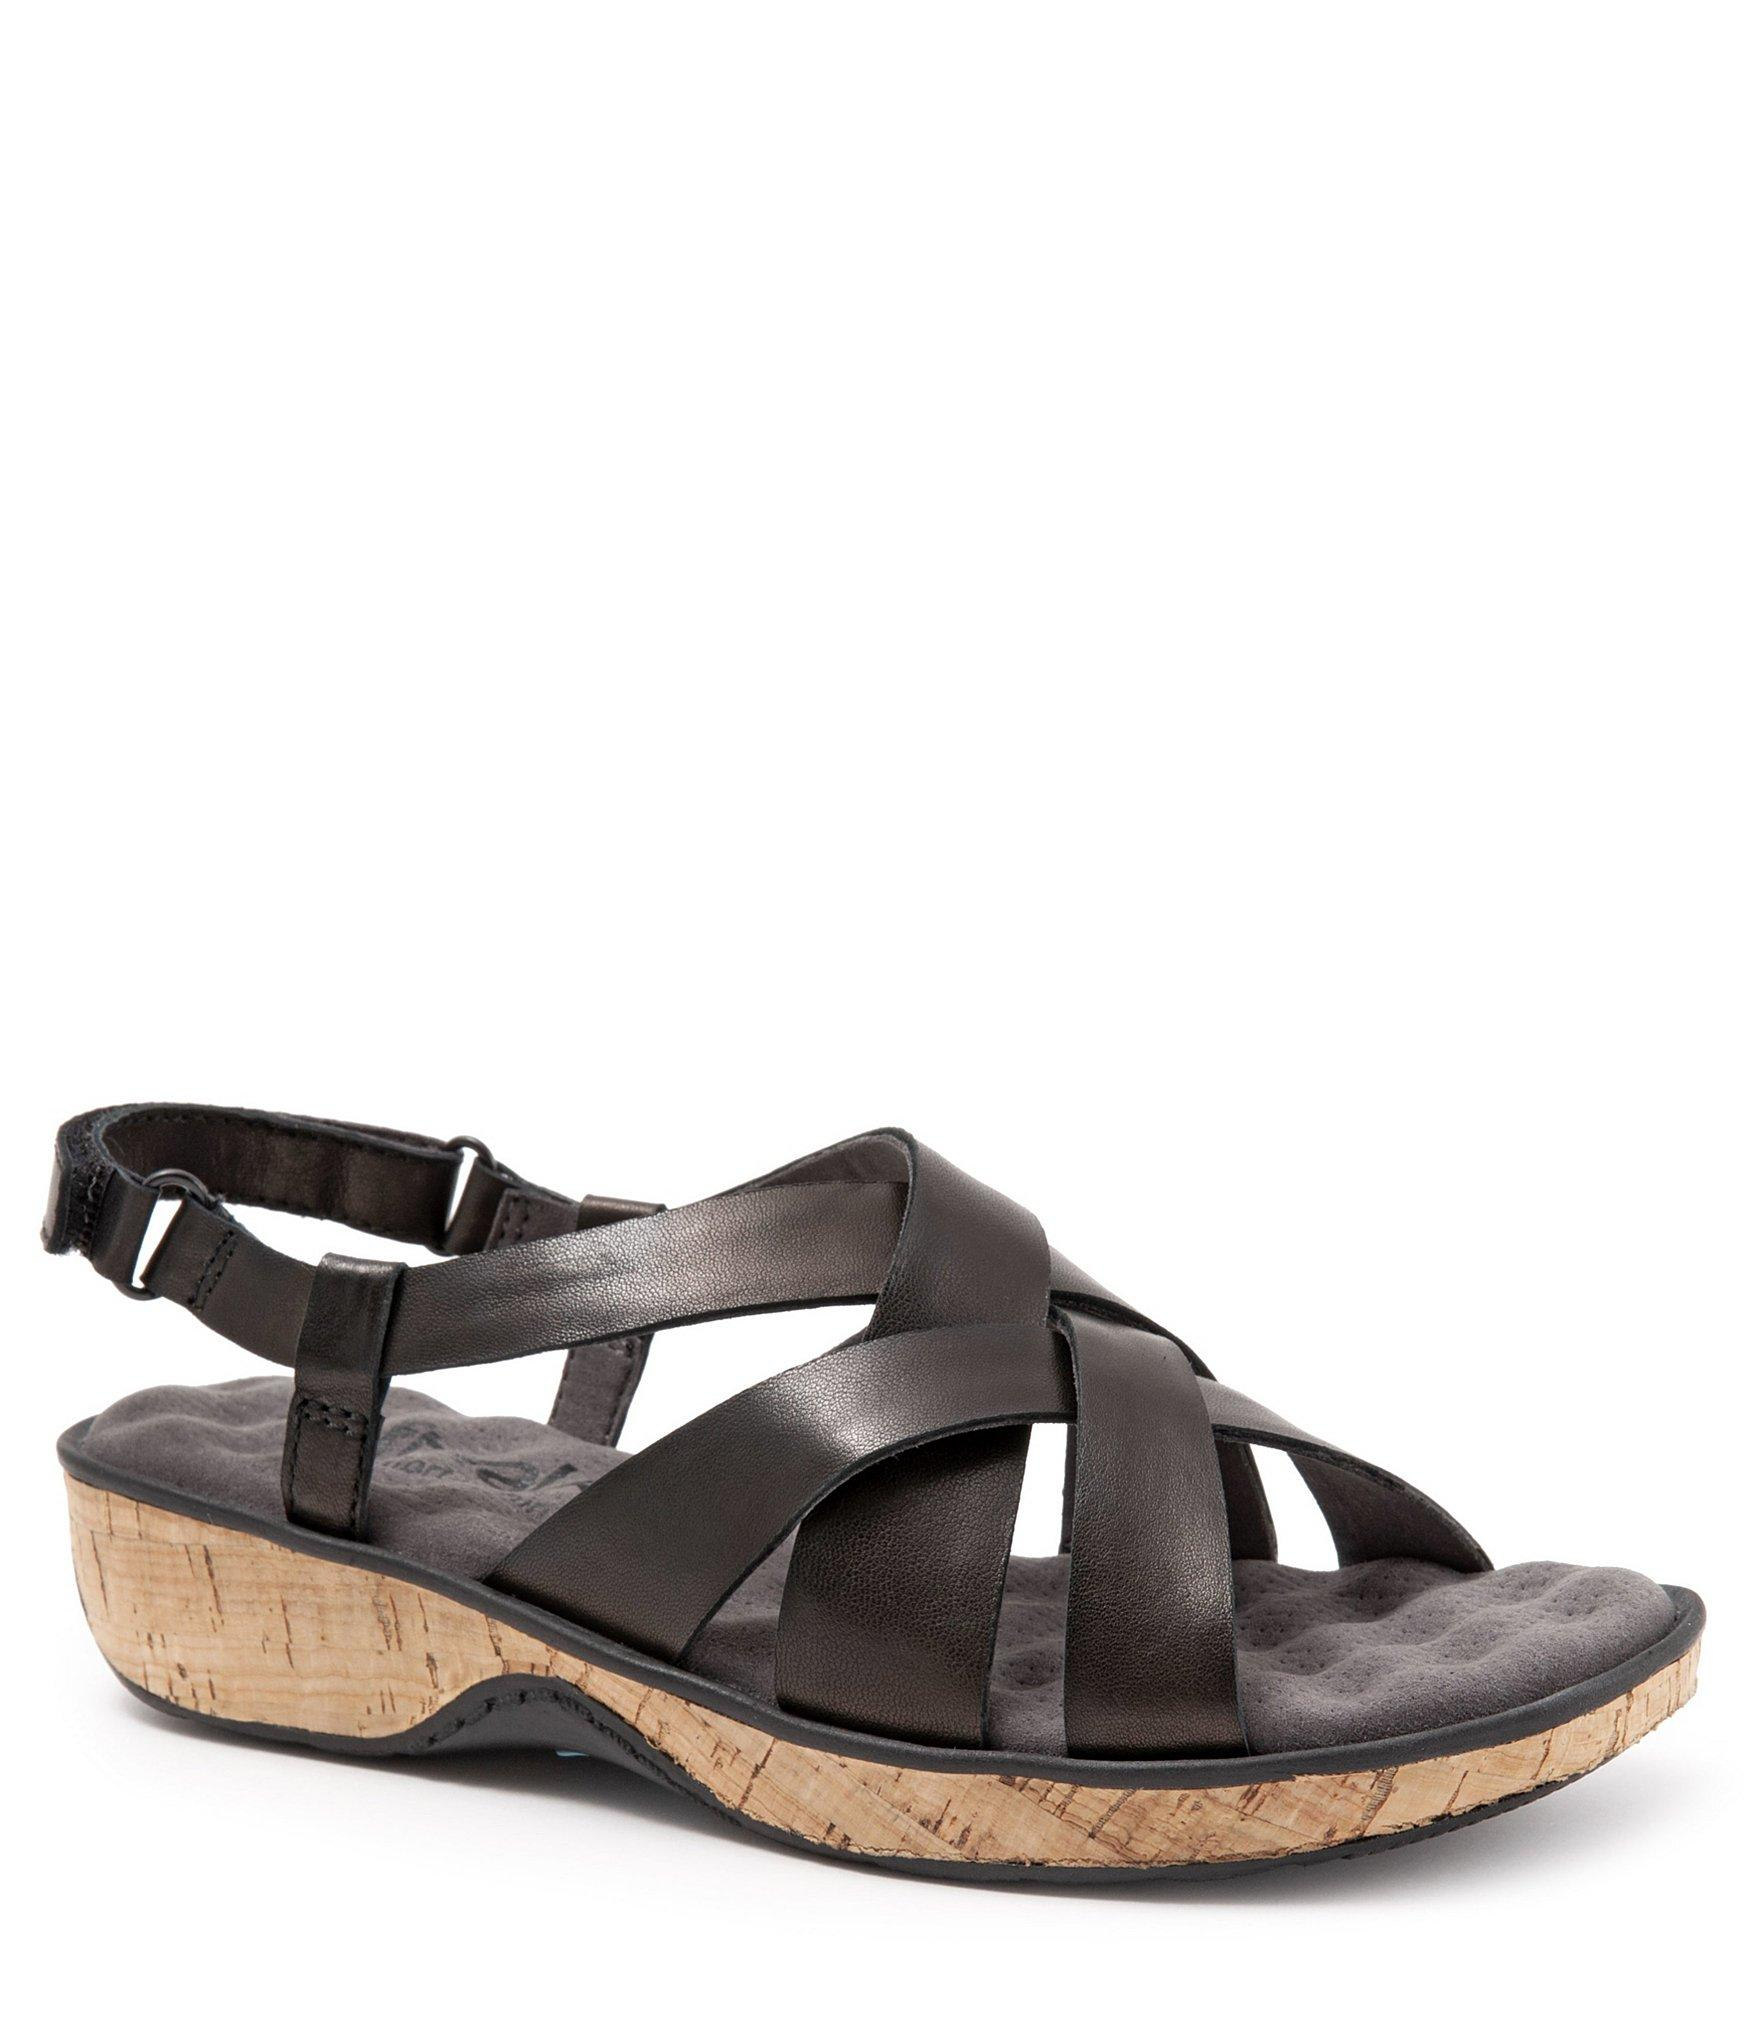 94157030bf6d3b Lyst - Softwalk Bonaire Leather Criss-cross Strap Sandals in Black